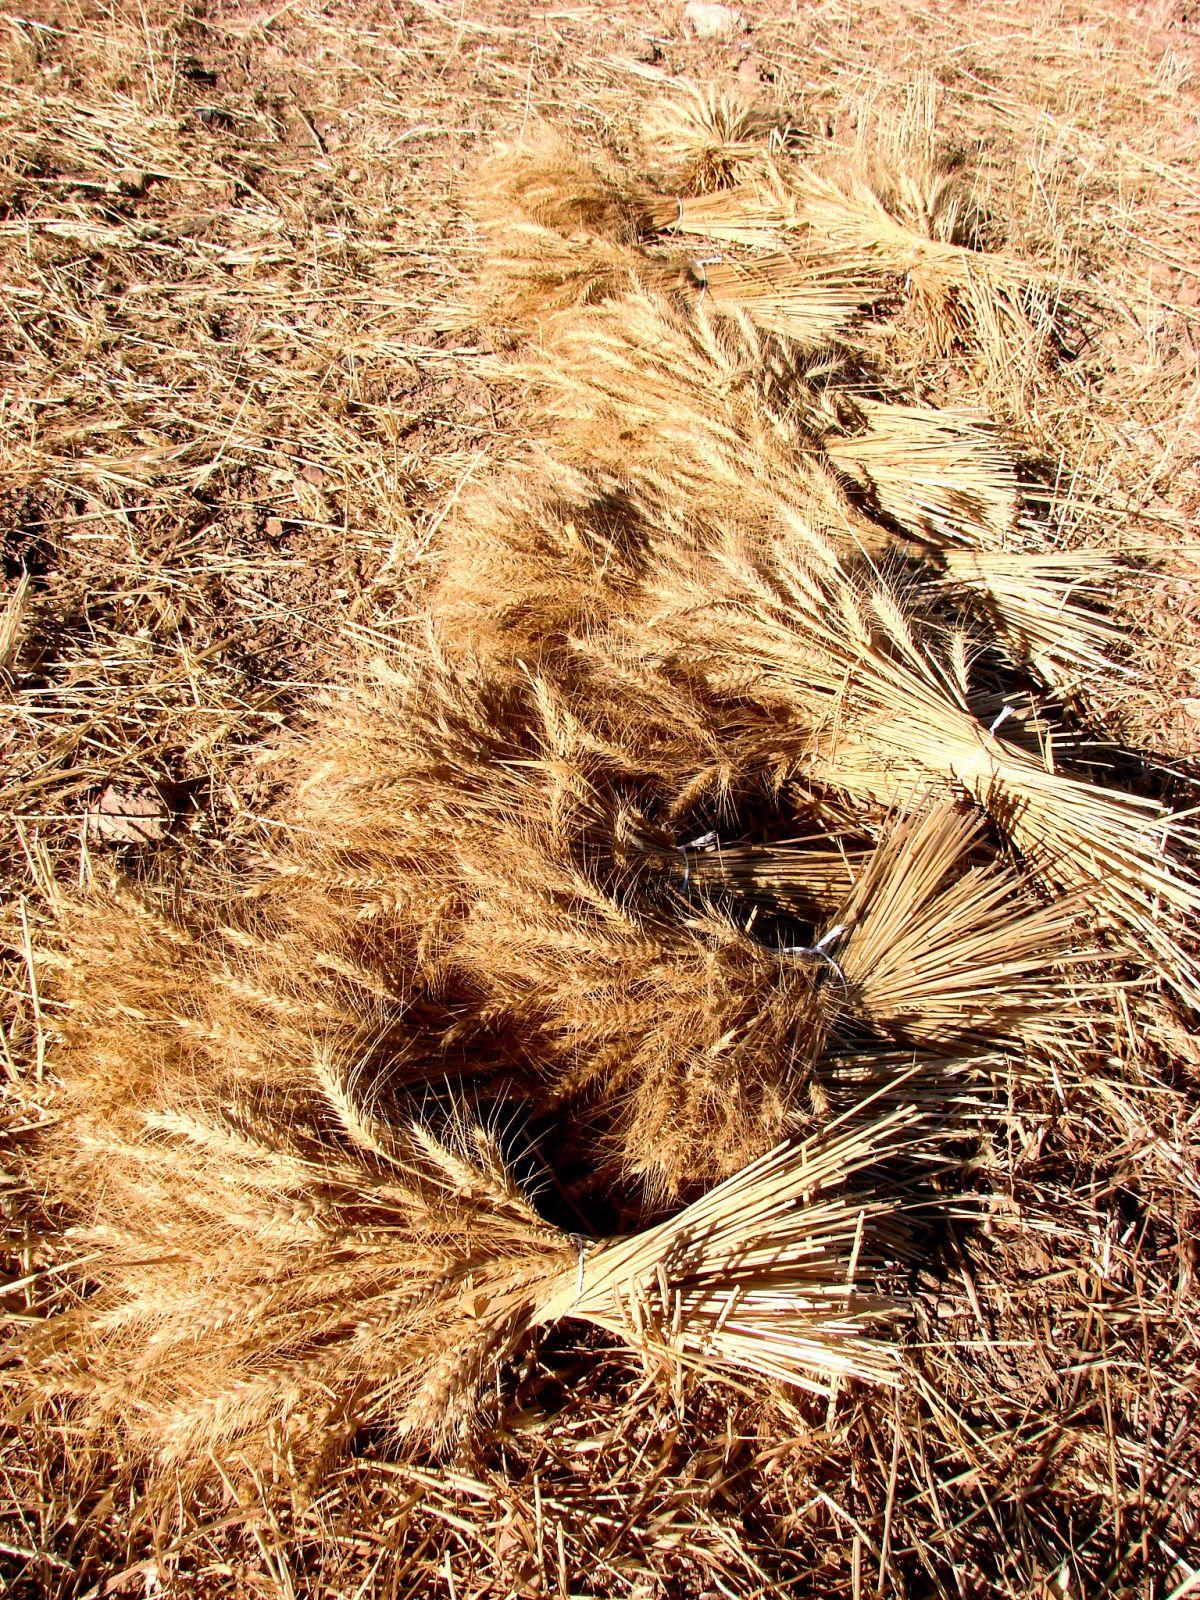 Wheat sheaves in a field on Moshav Naham.